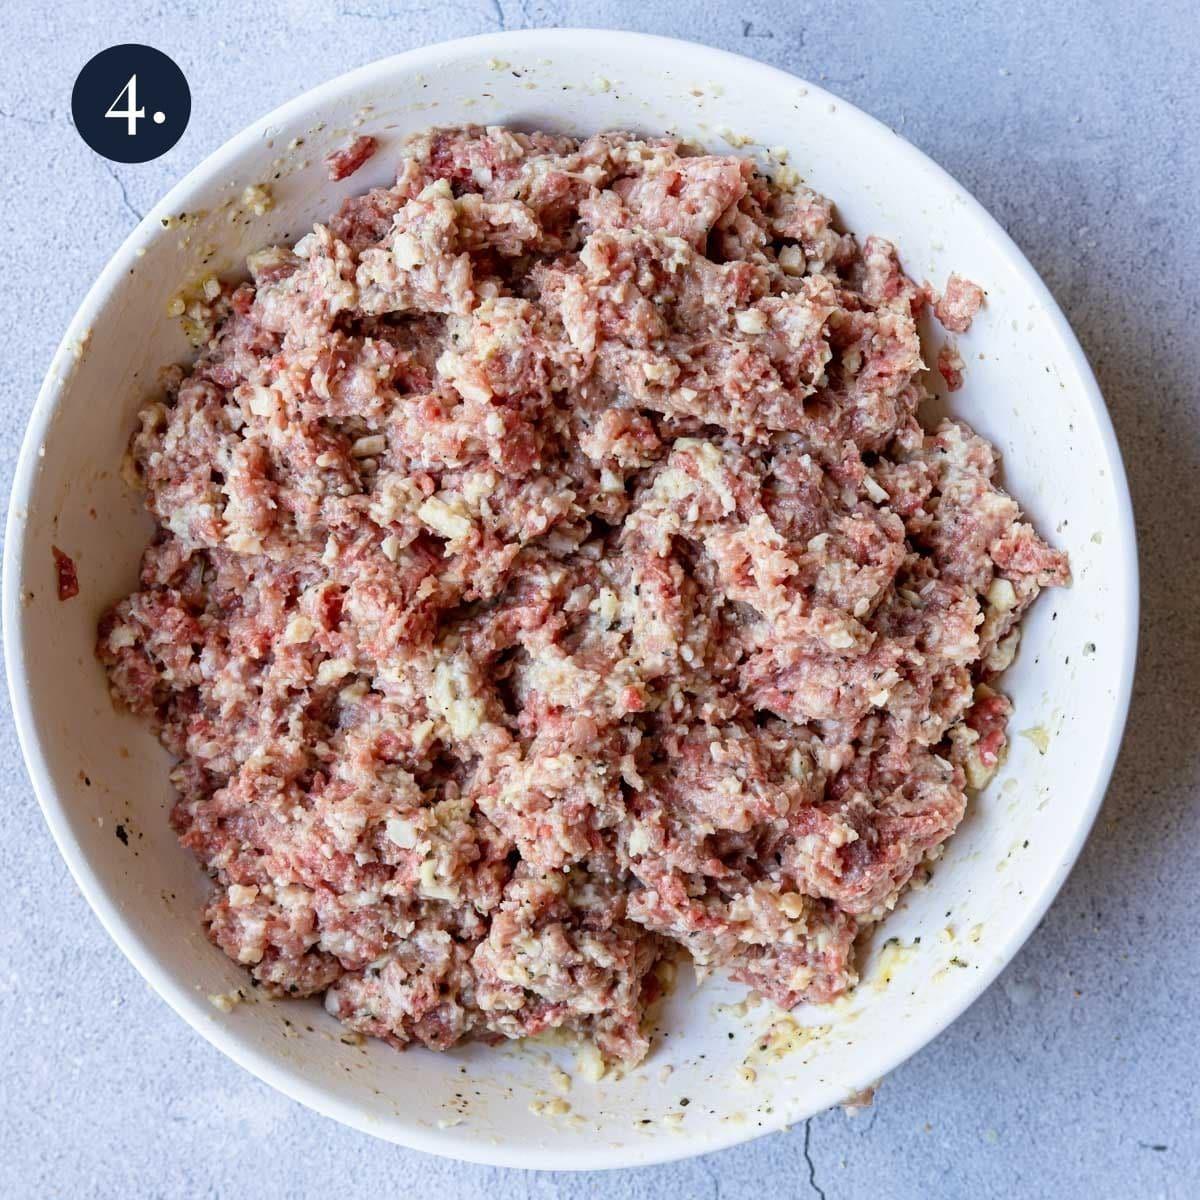 Italian meatball mixture in a bowl